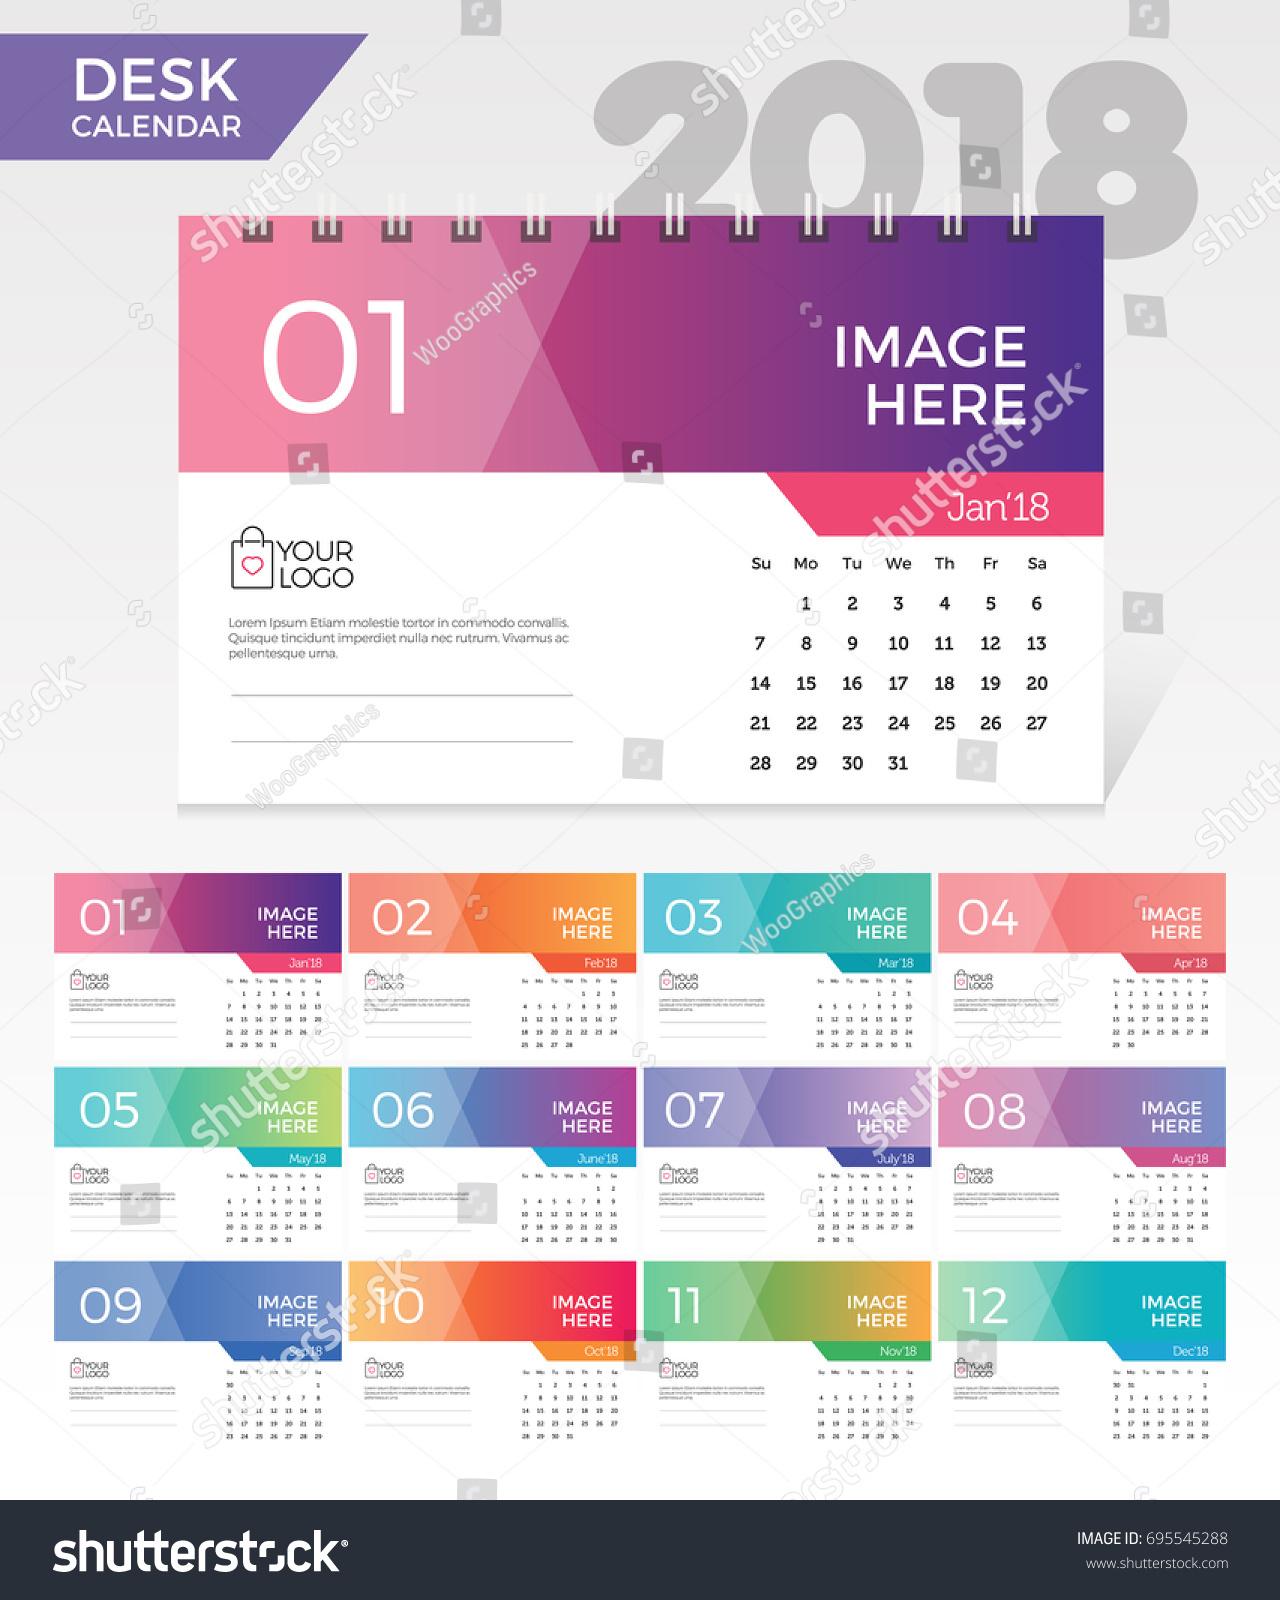 Calendar Design Elegant : Desk calendar simple colorful gradient stock vector